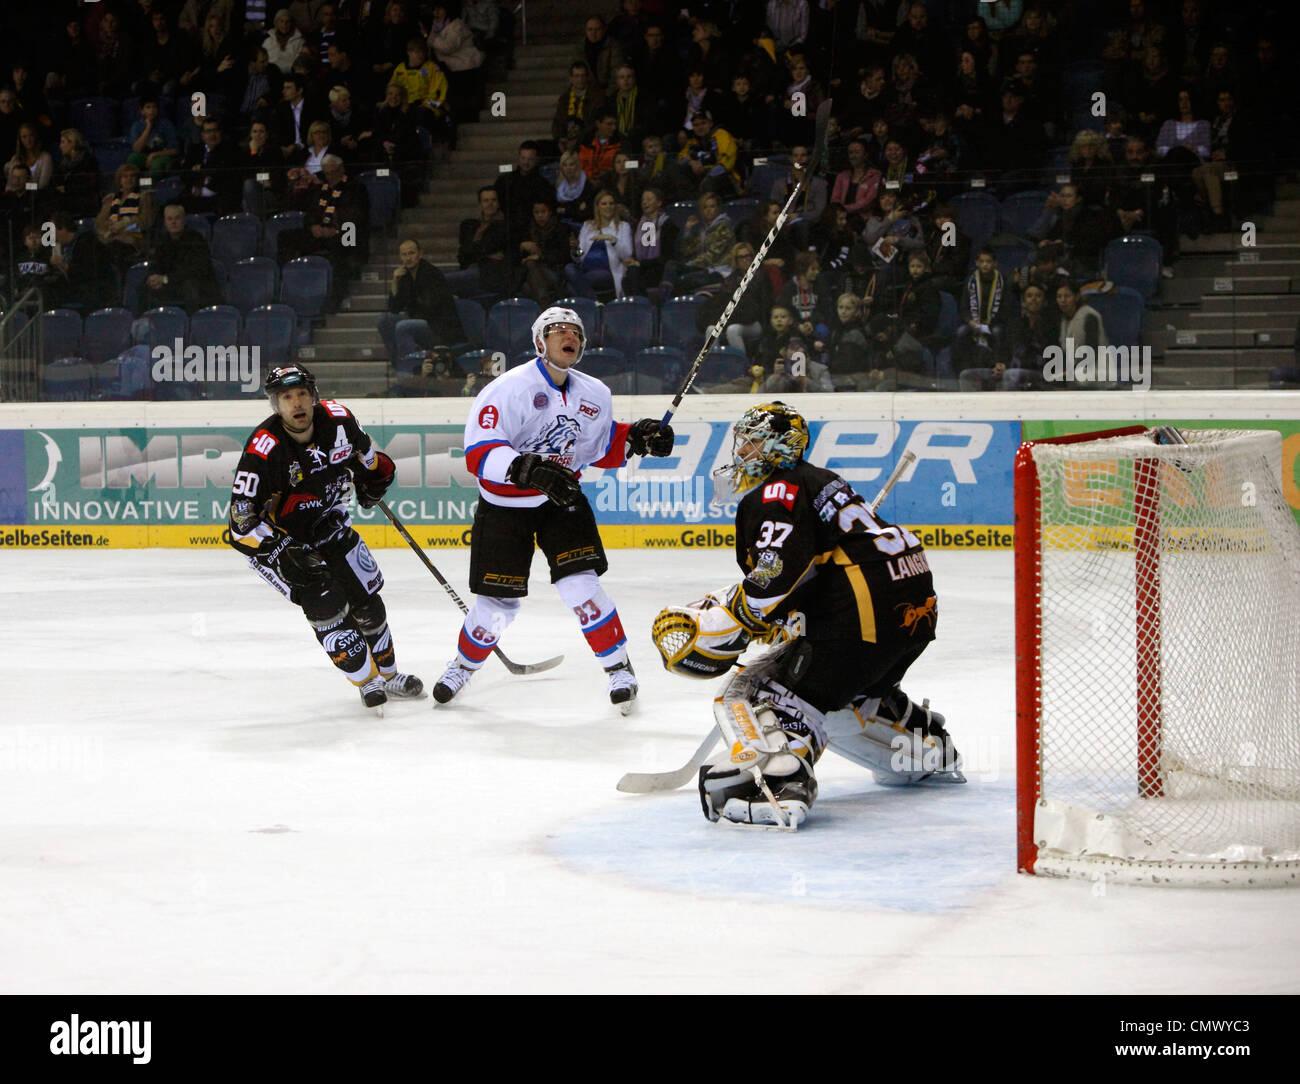 sports, ice hockey, Deutsche Eishockey Liga, 2011/2012, Krefeld Pinguine versus Nuernberg Ice Tigers 1:3, scene - Stock Image